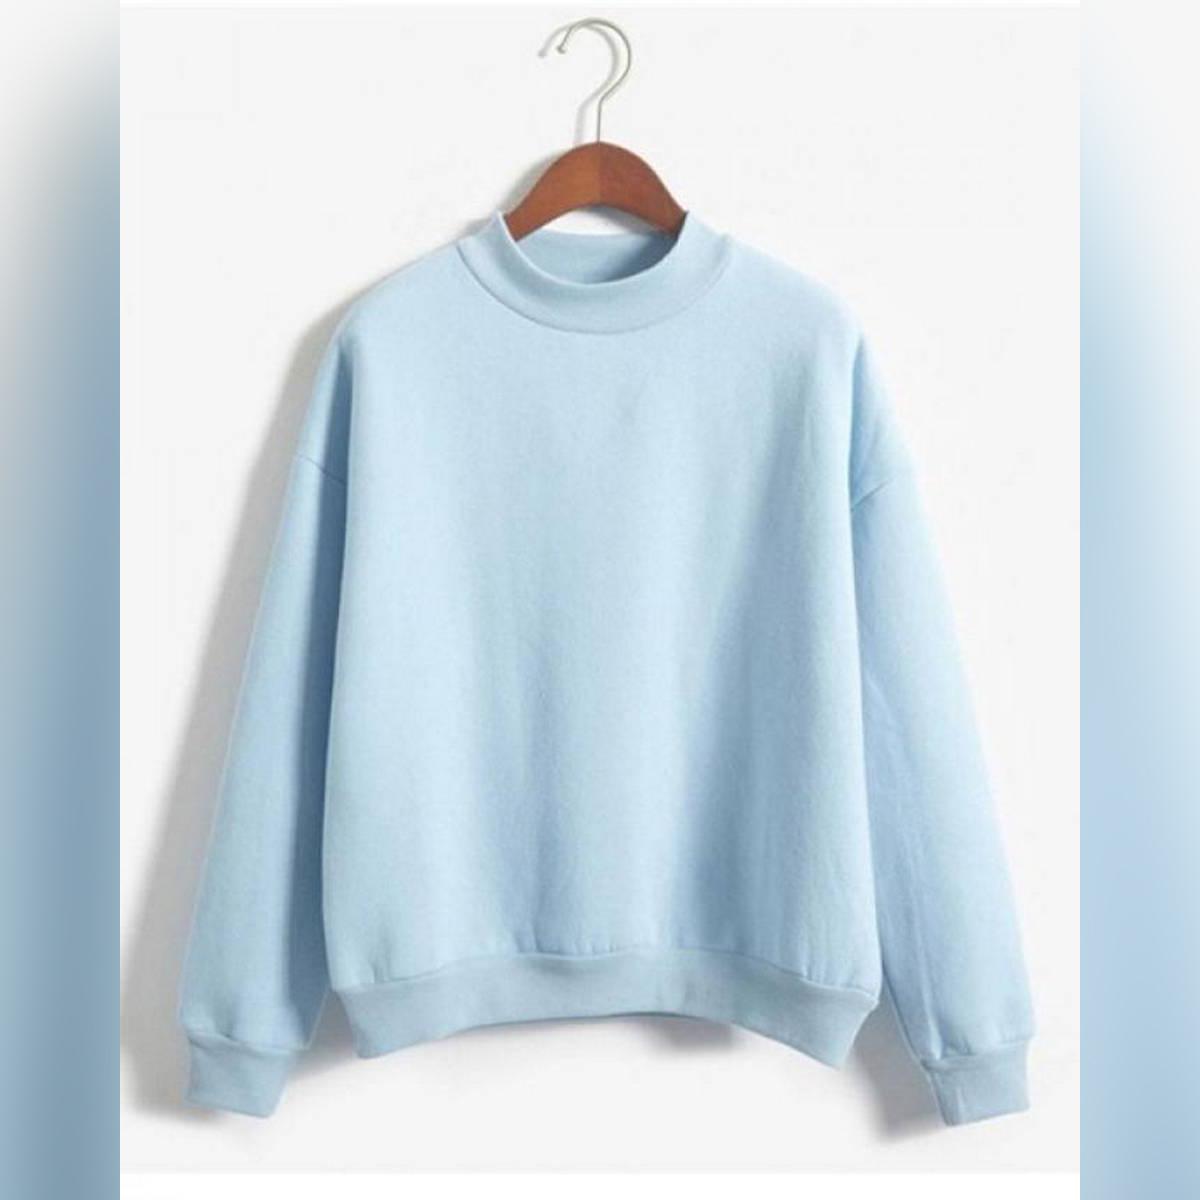 Sweatshirt 2018 Winter Casual Loose Fleece Pullover Sky Blue